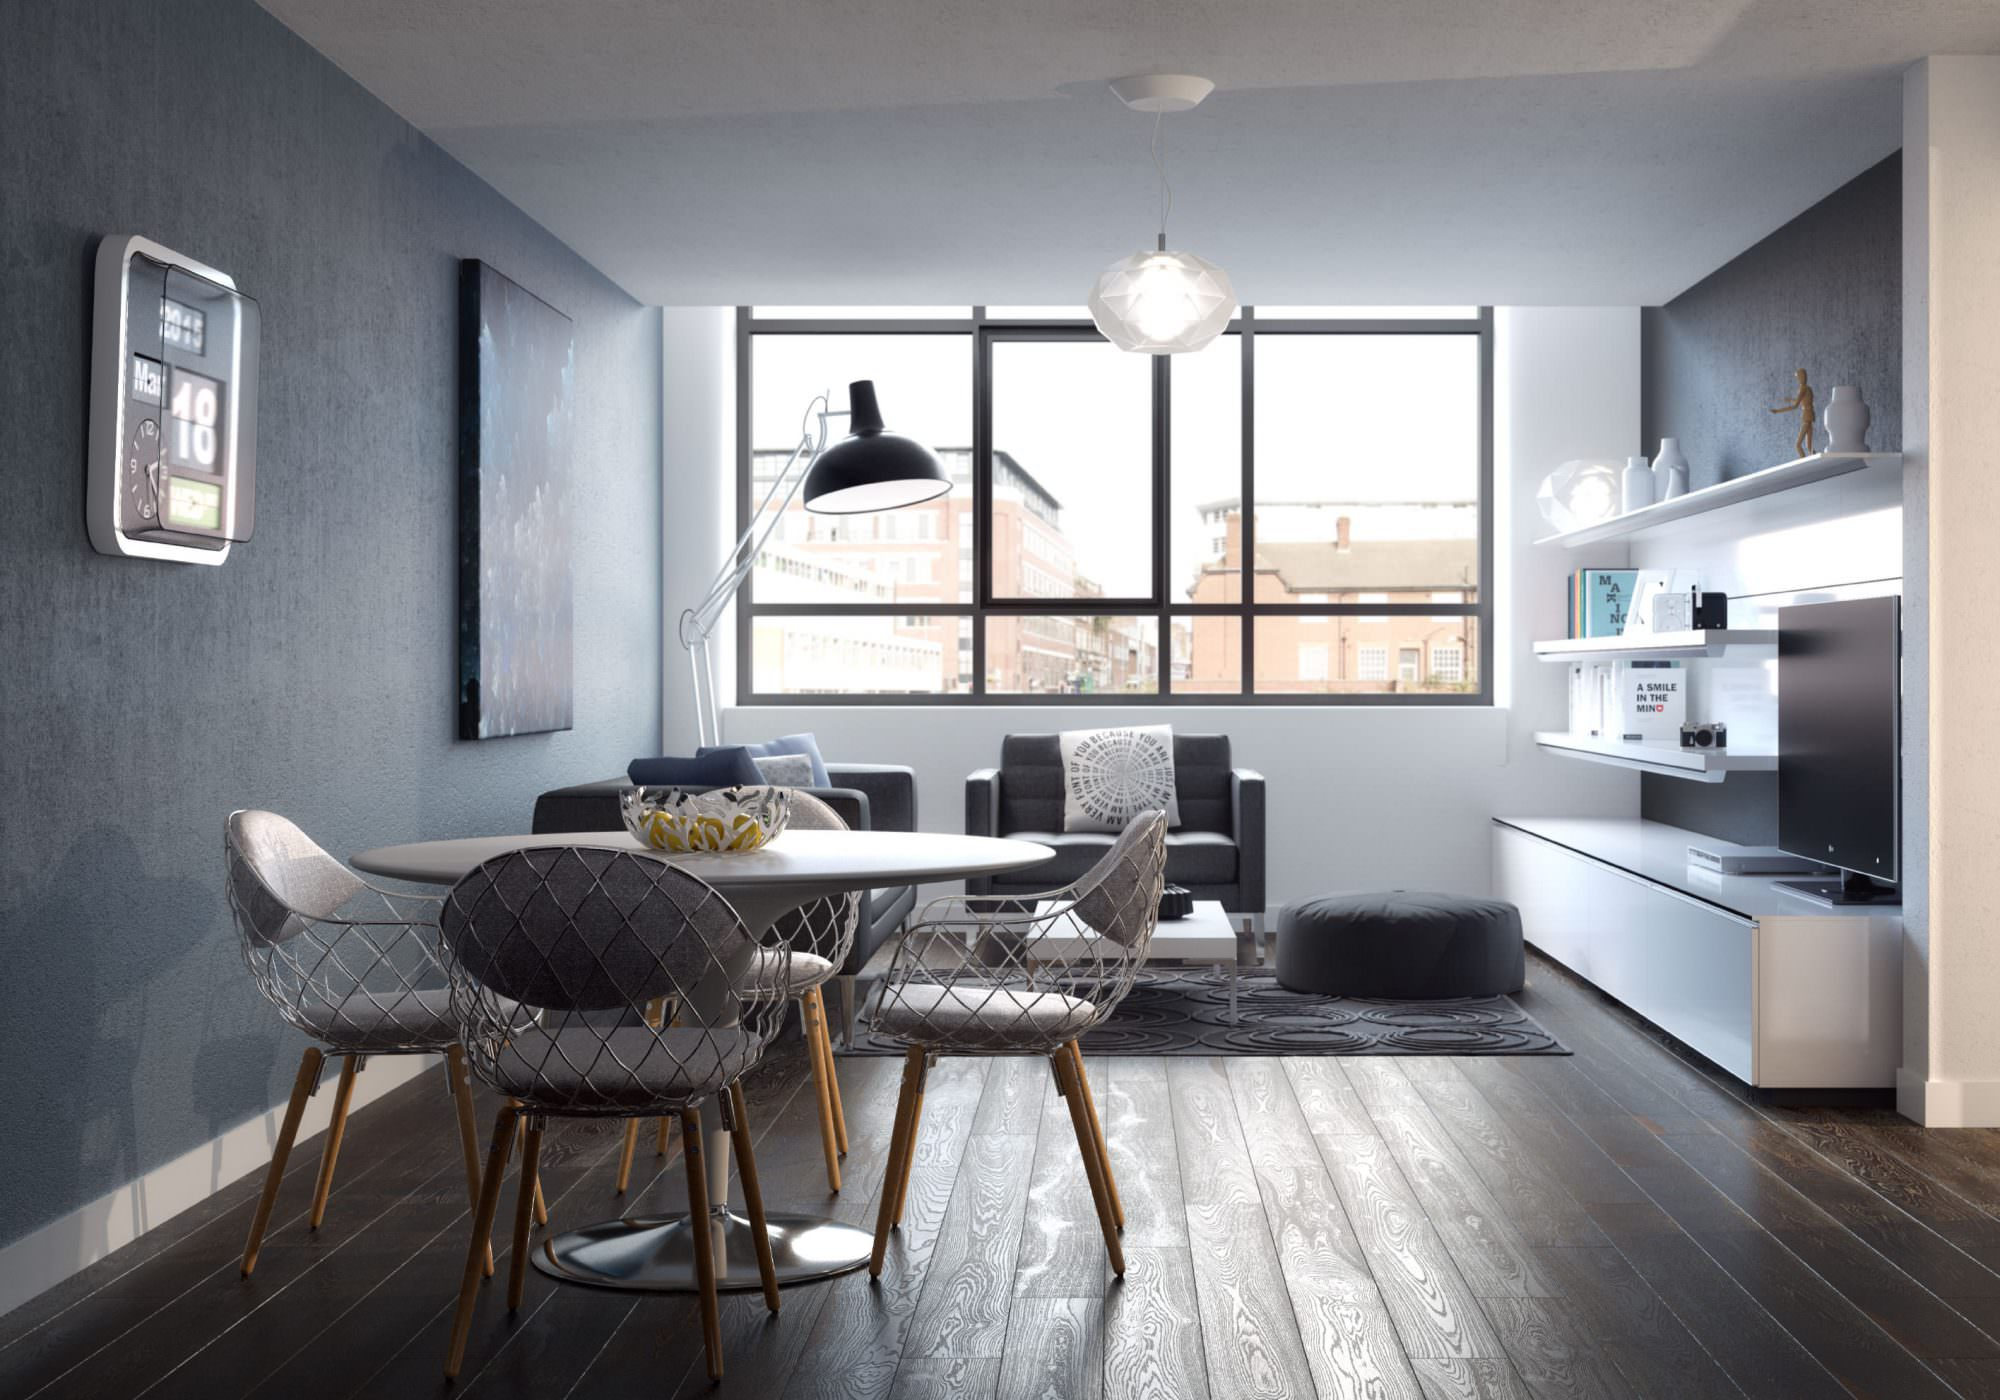 Building Design Group - Professional Website Design In Shropshire